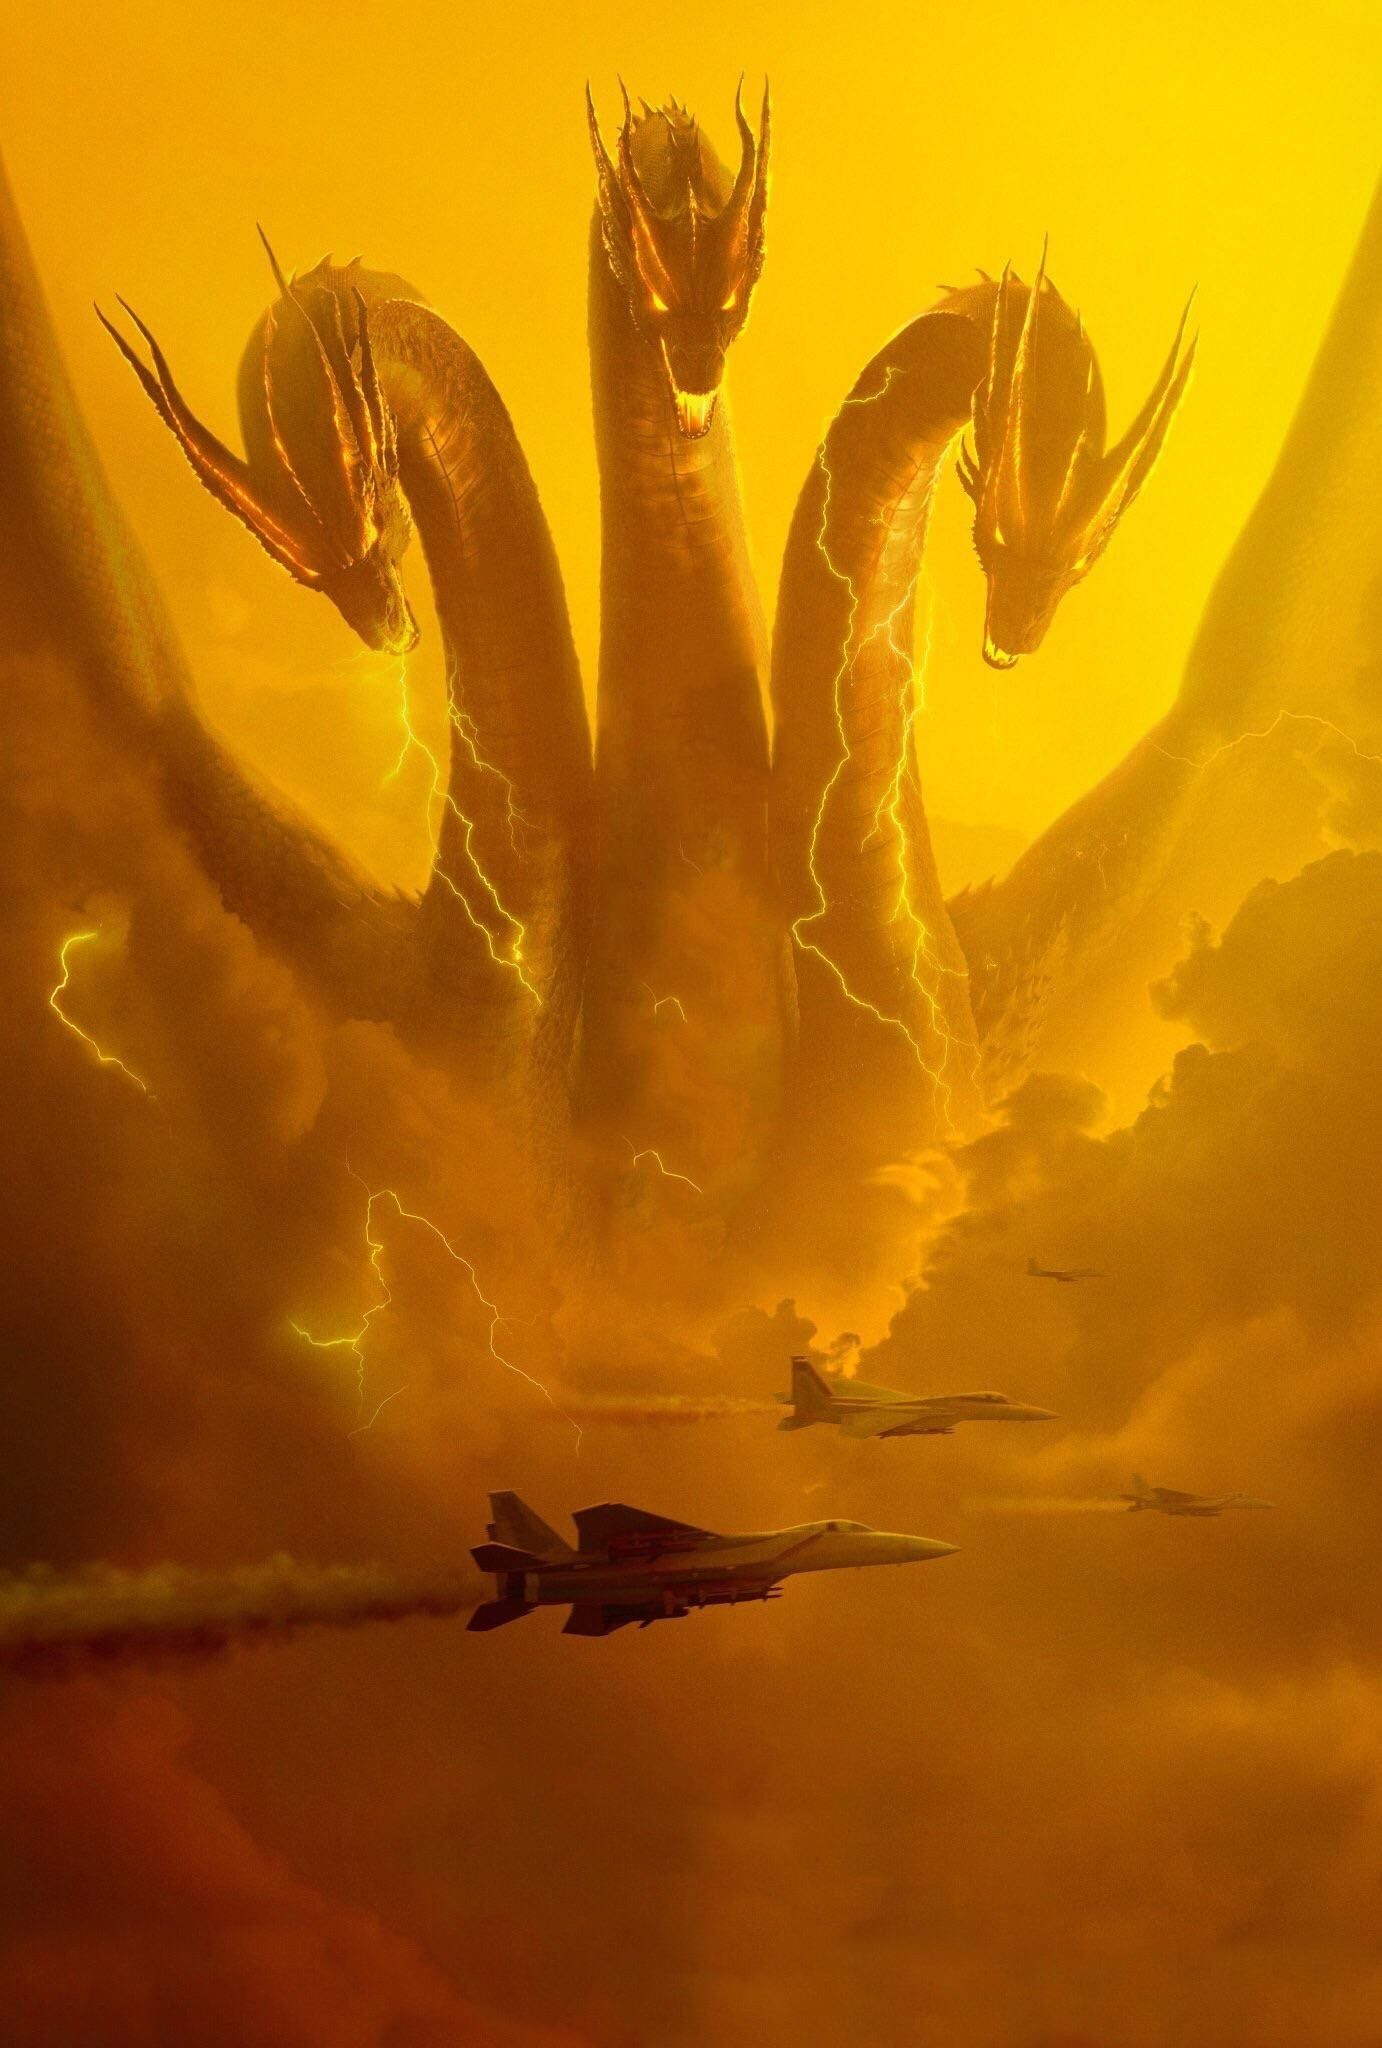 Official King Ghidorah 2019 Poster Textless Godzilla